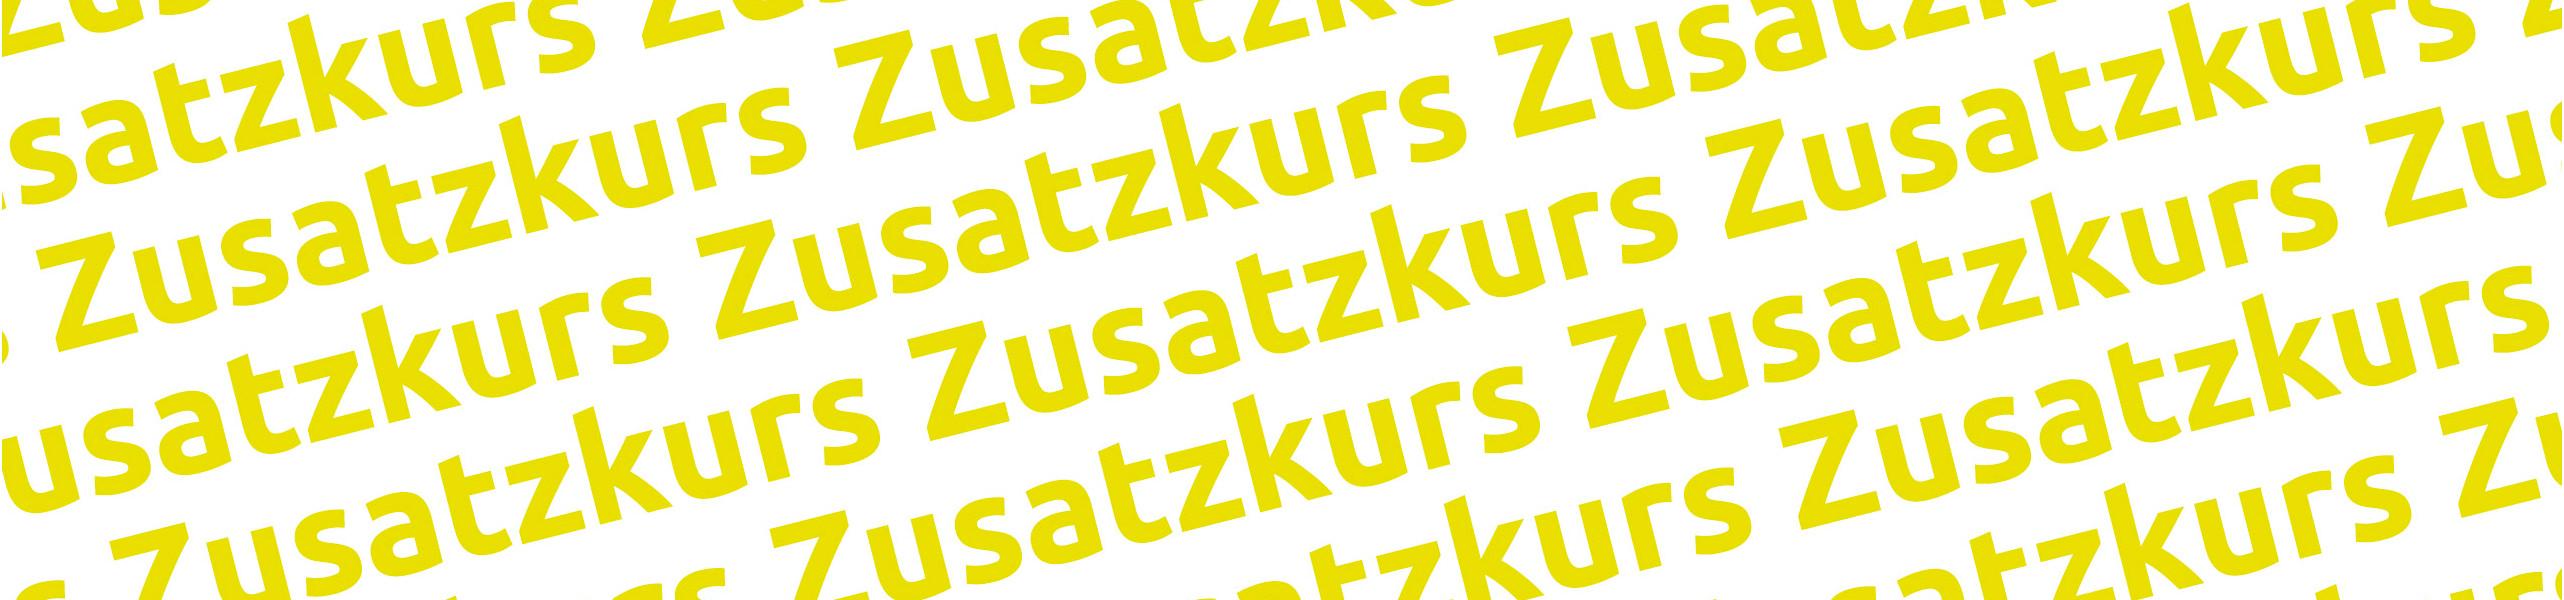 Zusatzkurs – AZPP